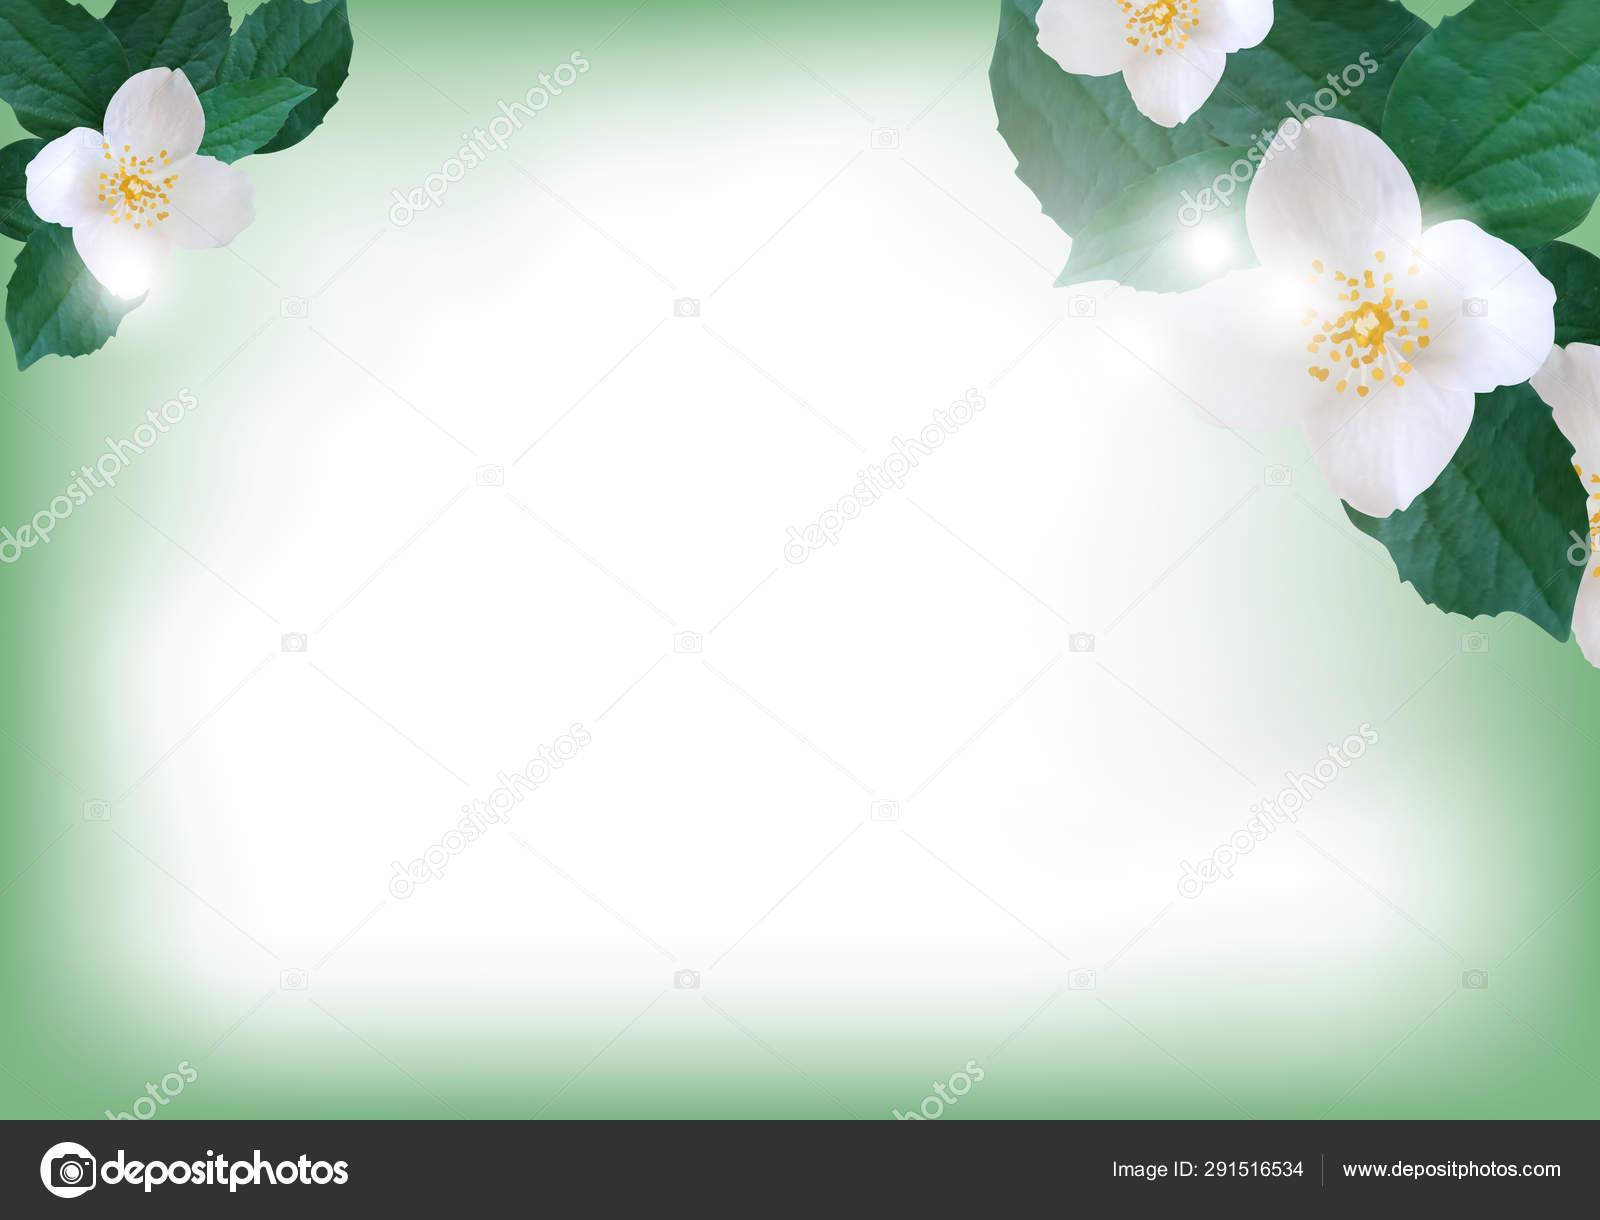 Flowers Jasmine Elegant Background For Greeting Card Or Wedding